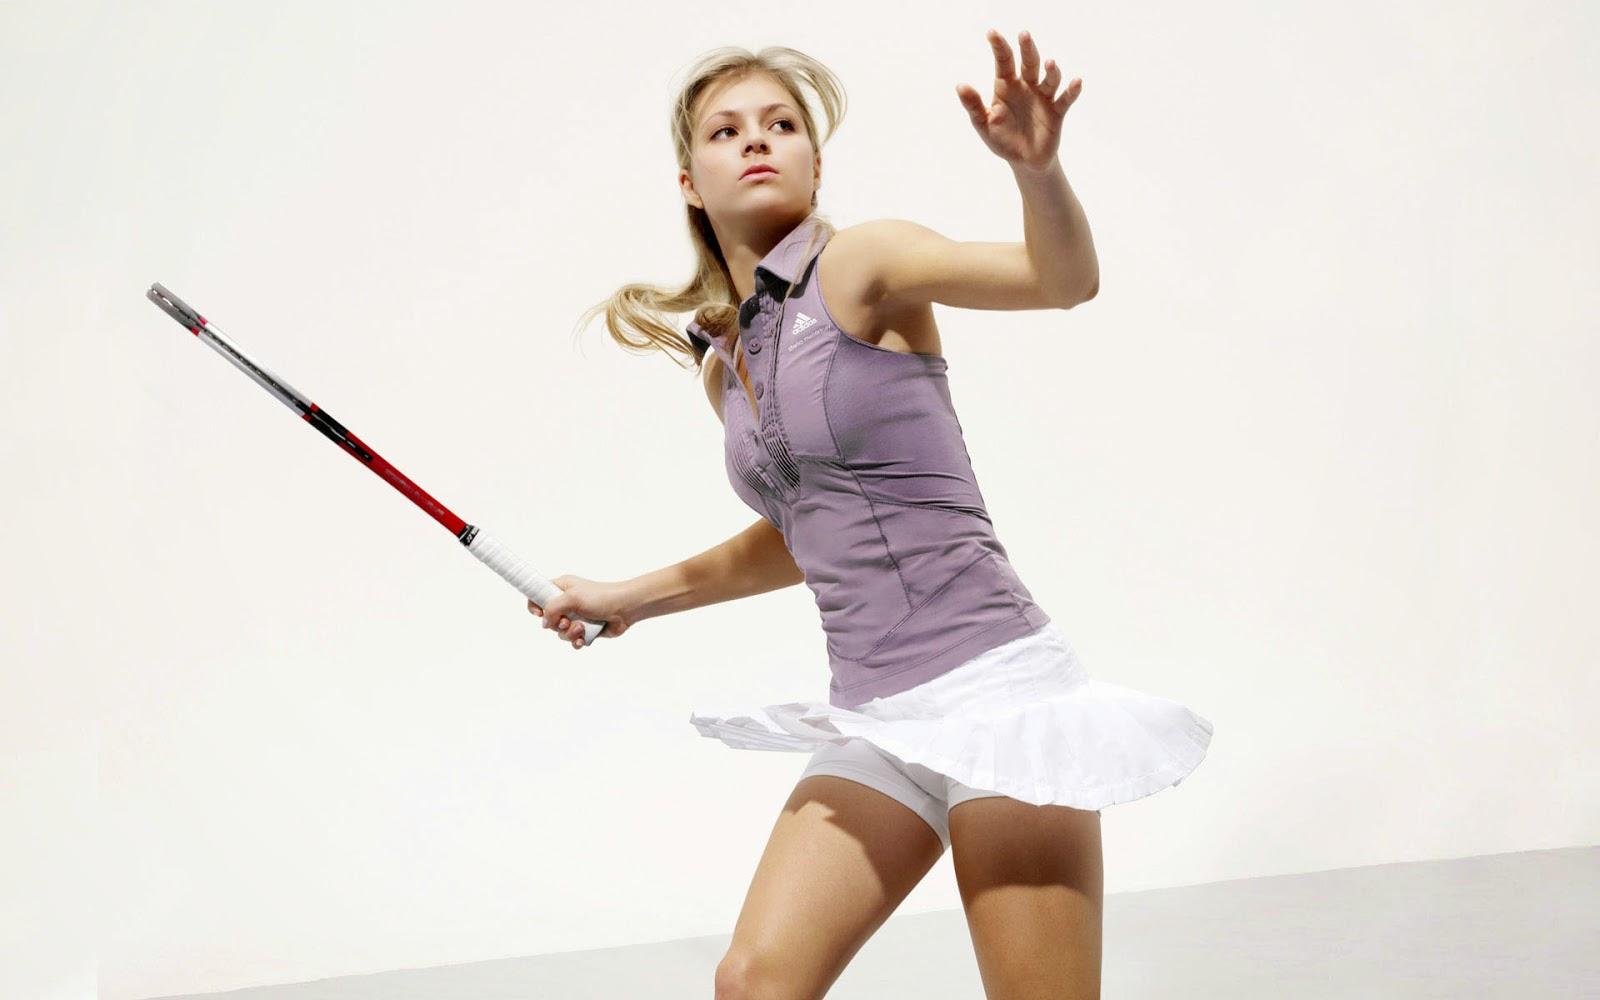 Tennis Player Sport Wallpaper Free Download Full Hd Wallpaper